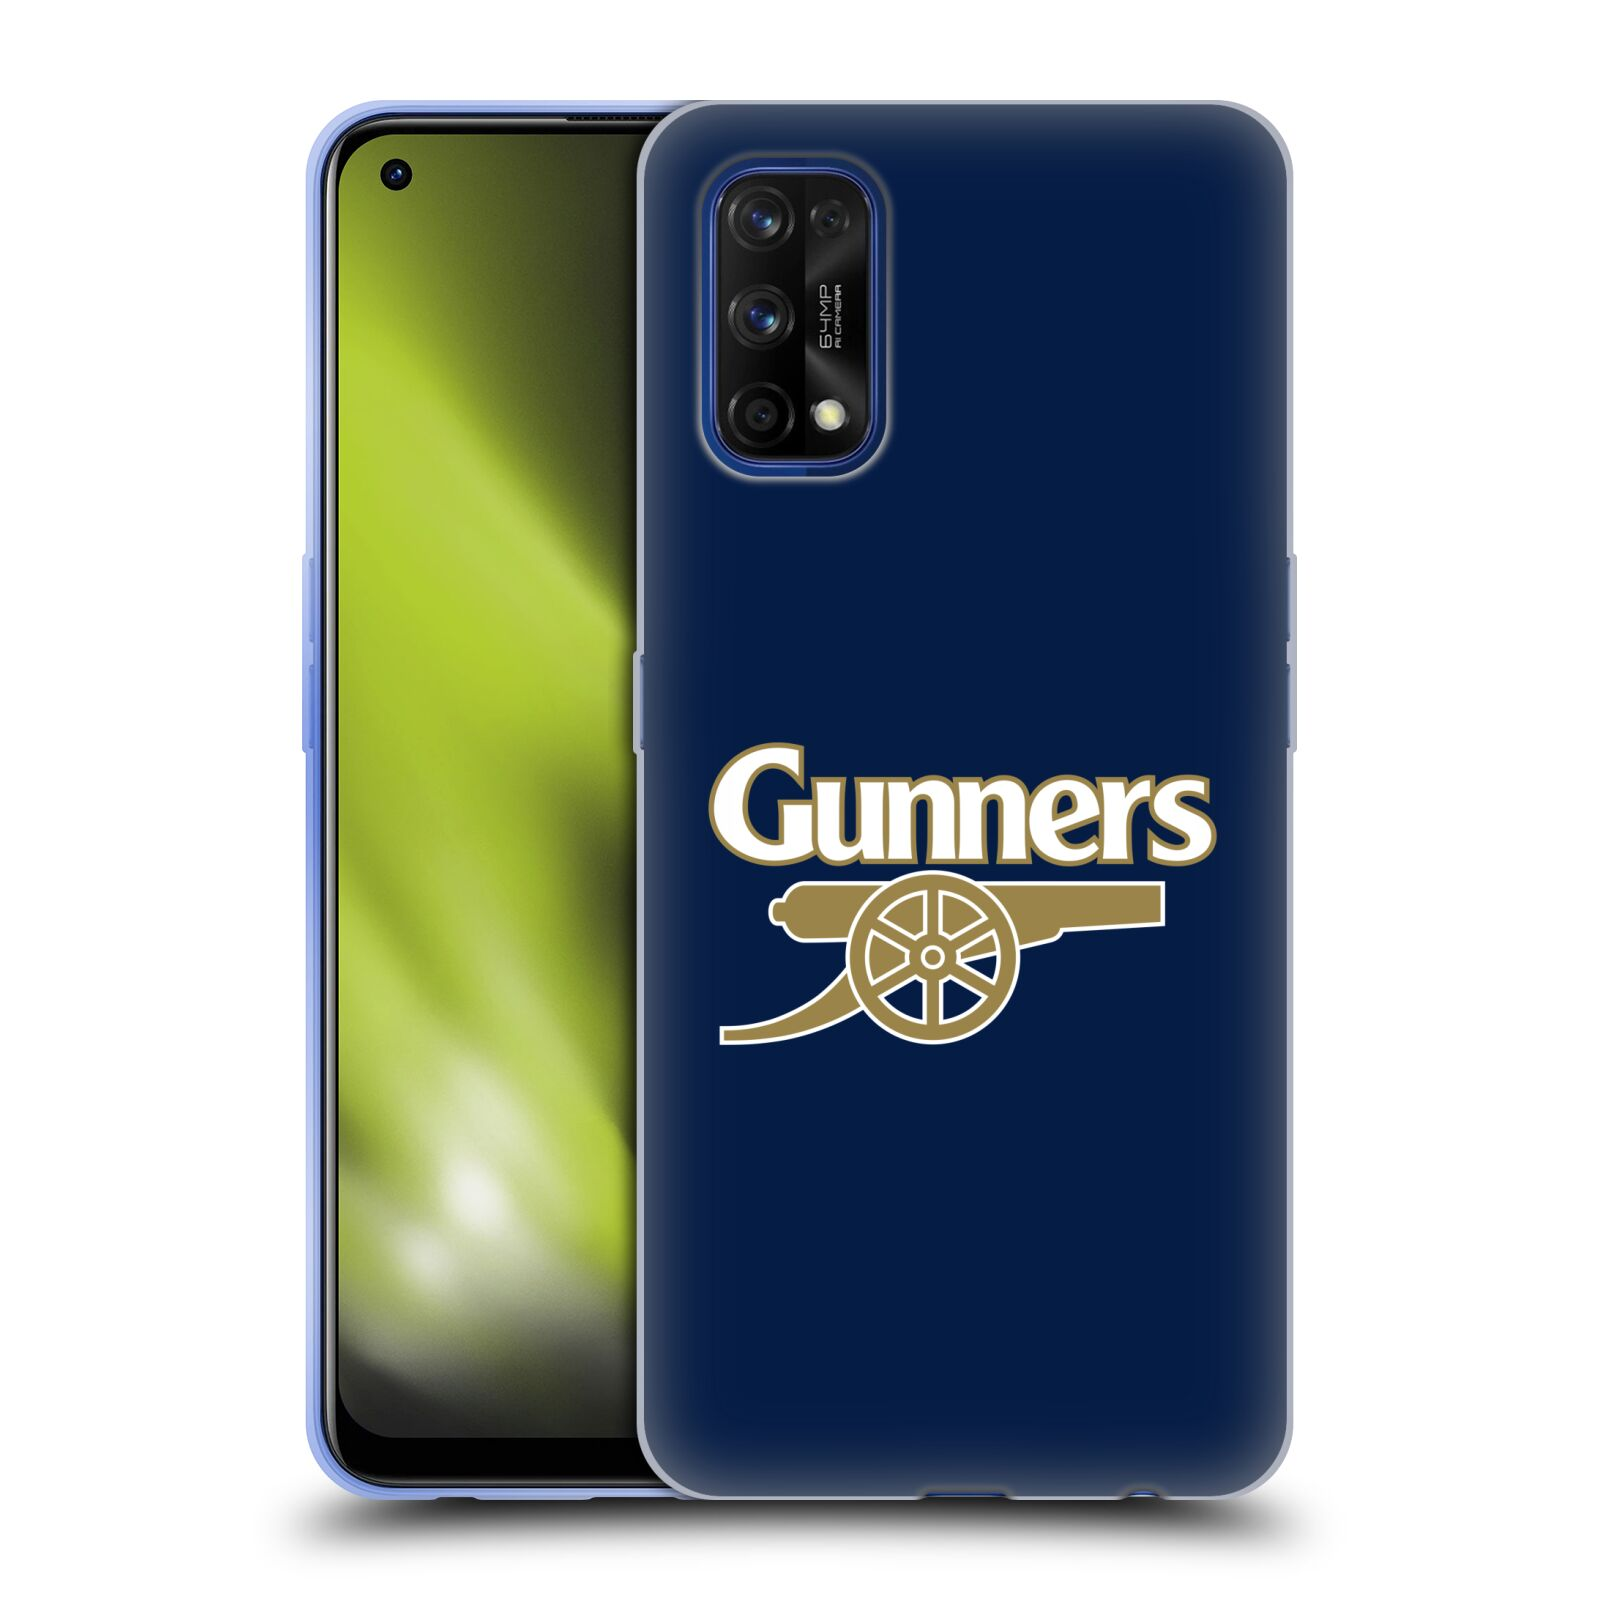 Silikonové pouzdro na mobil Realme 7 Pro - Head Case - Arsenal FC - Gunners